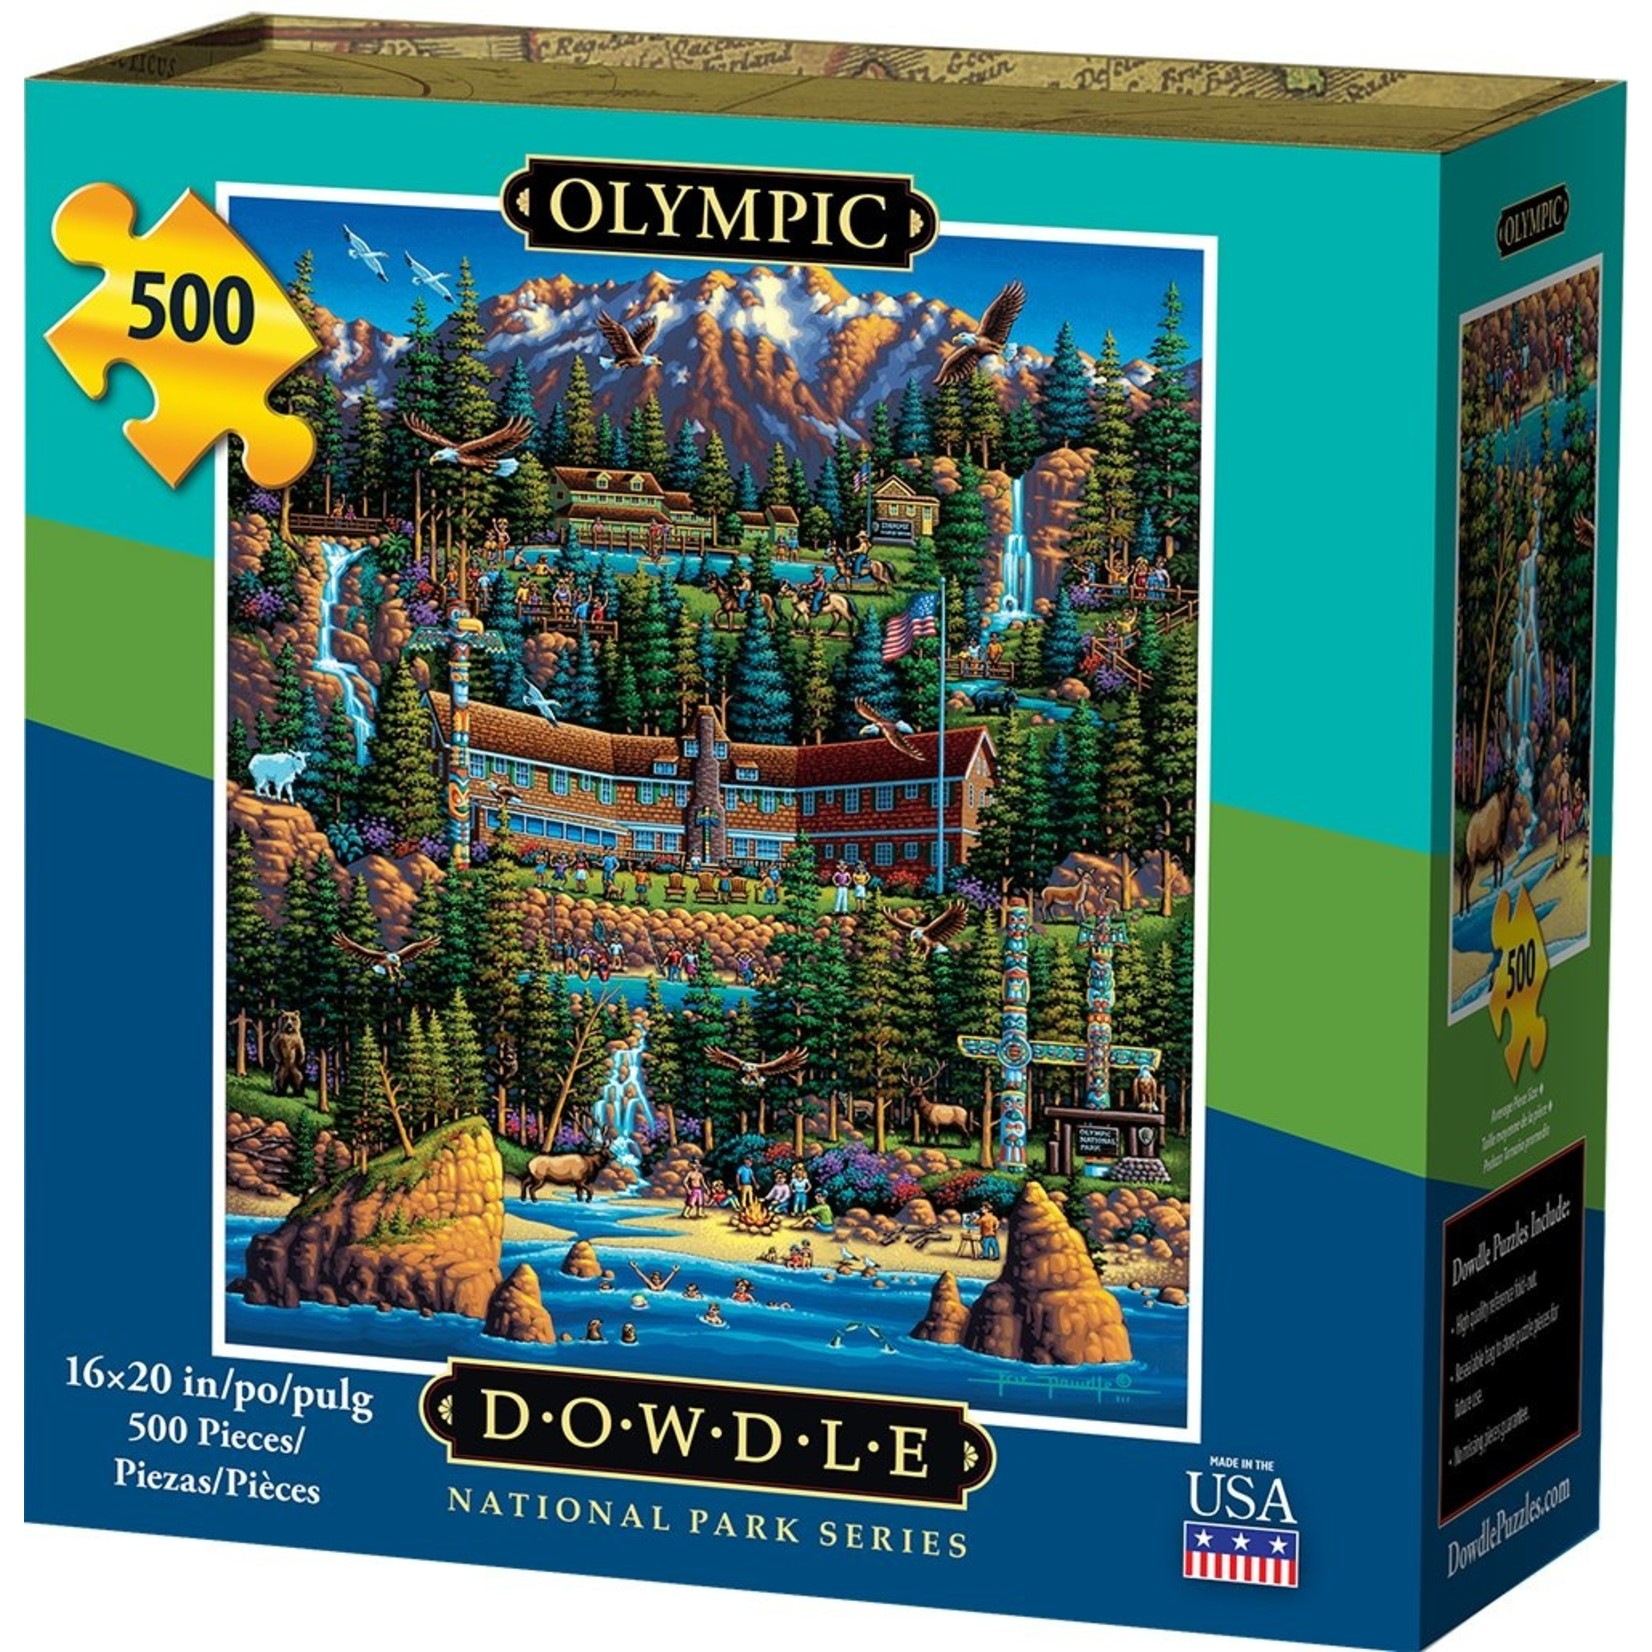 Dowdle Folkart Olympic National Park 500pc